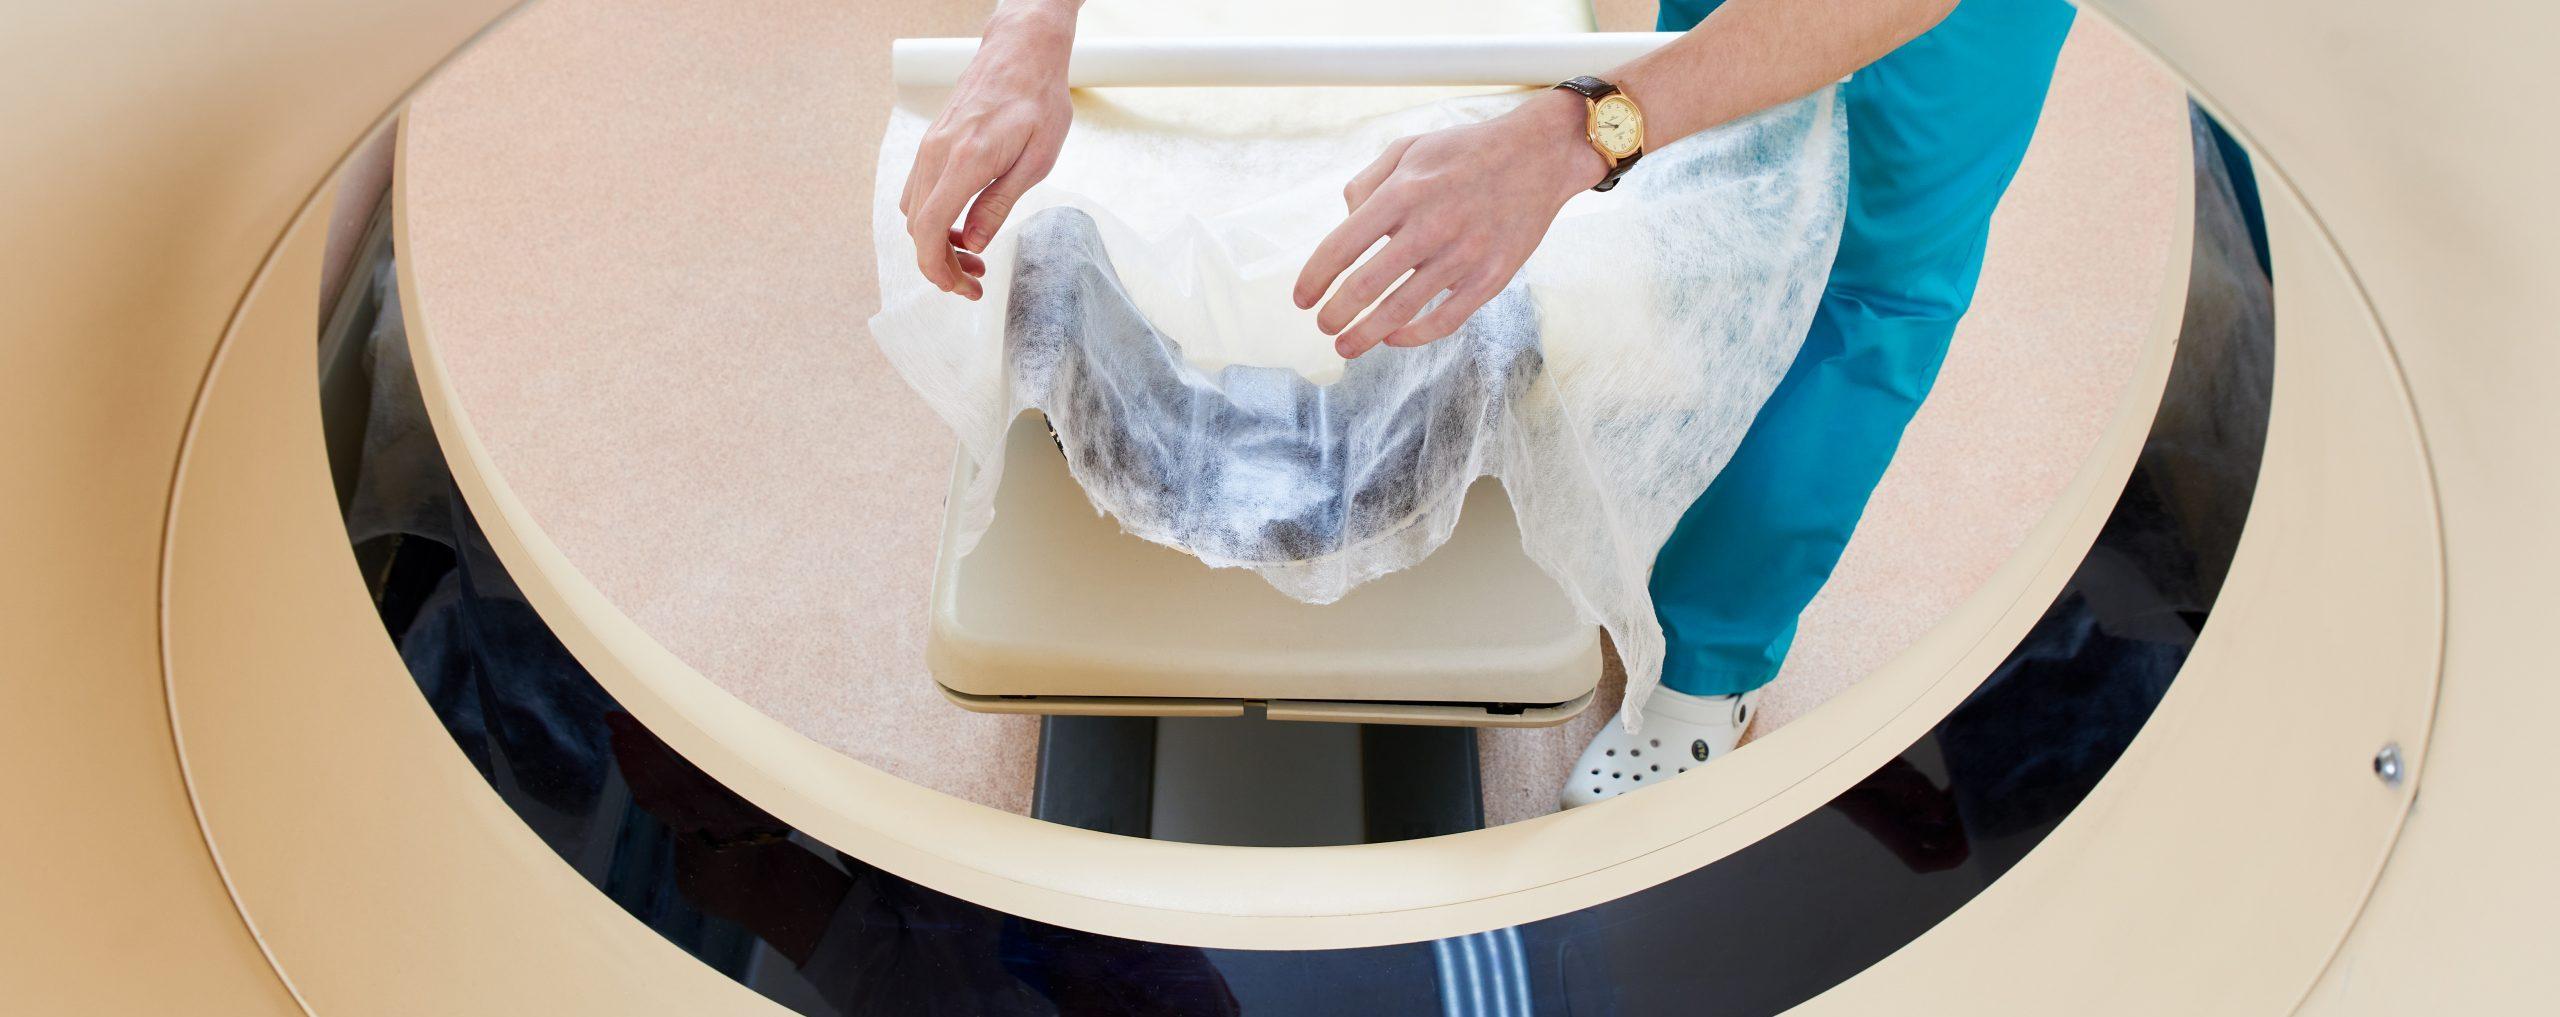 preparing ct scanner machine